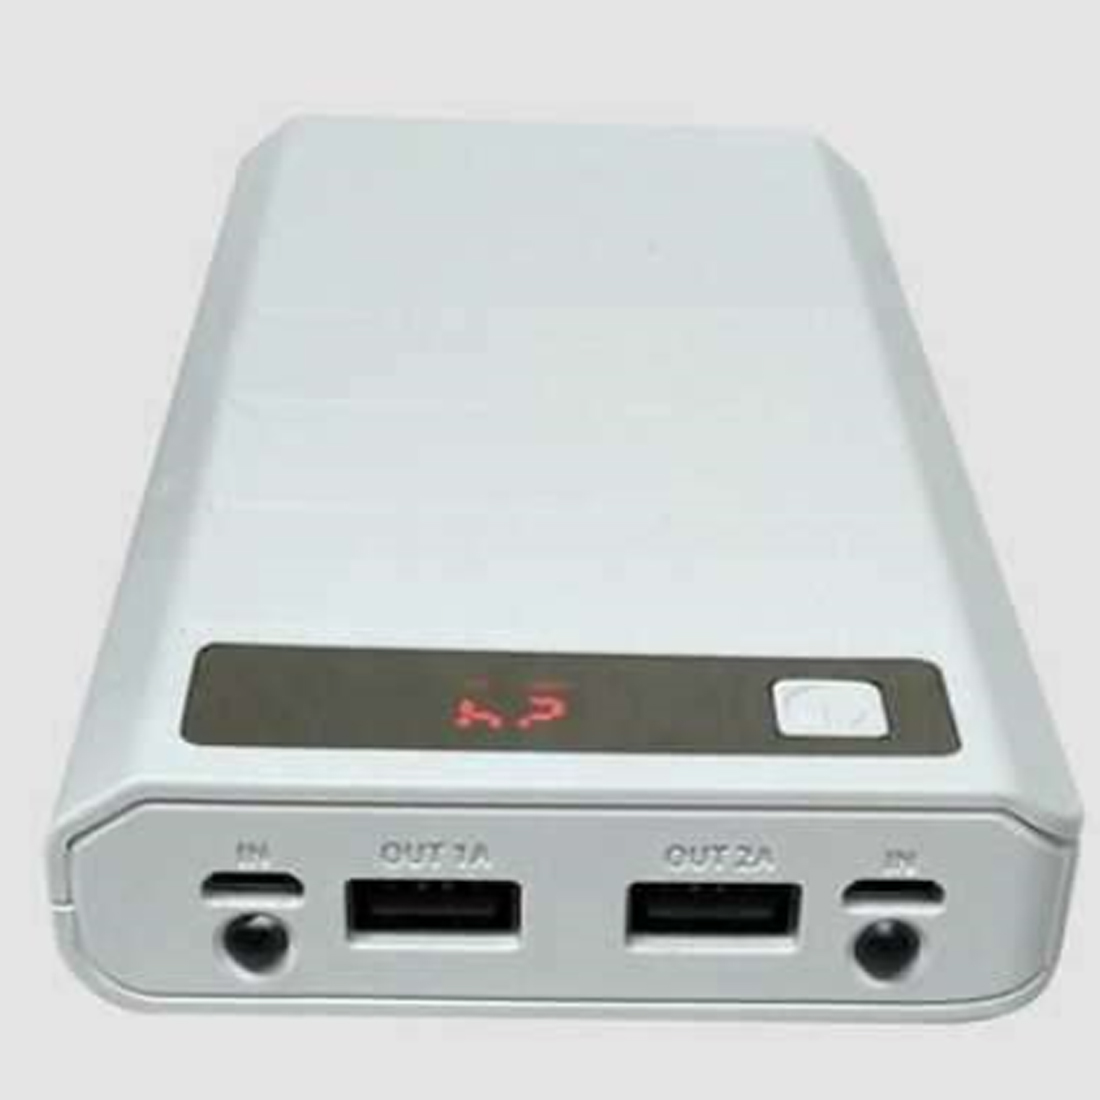 Marsnaska Portable USB Power Bank Shell Box DIY USB Mobile Power Bank Charger Case Pack 8pcs 18650 Battery Holder LCD